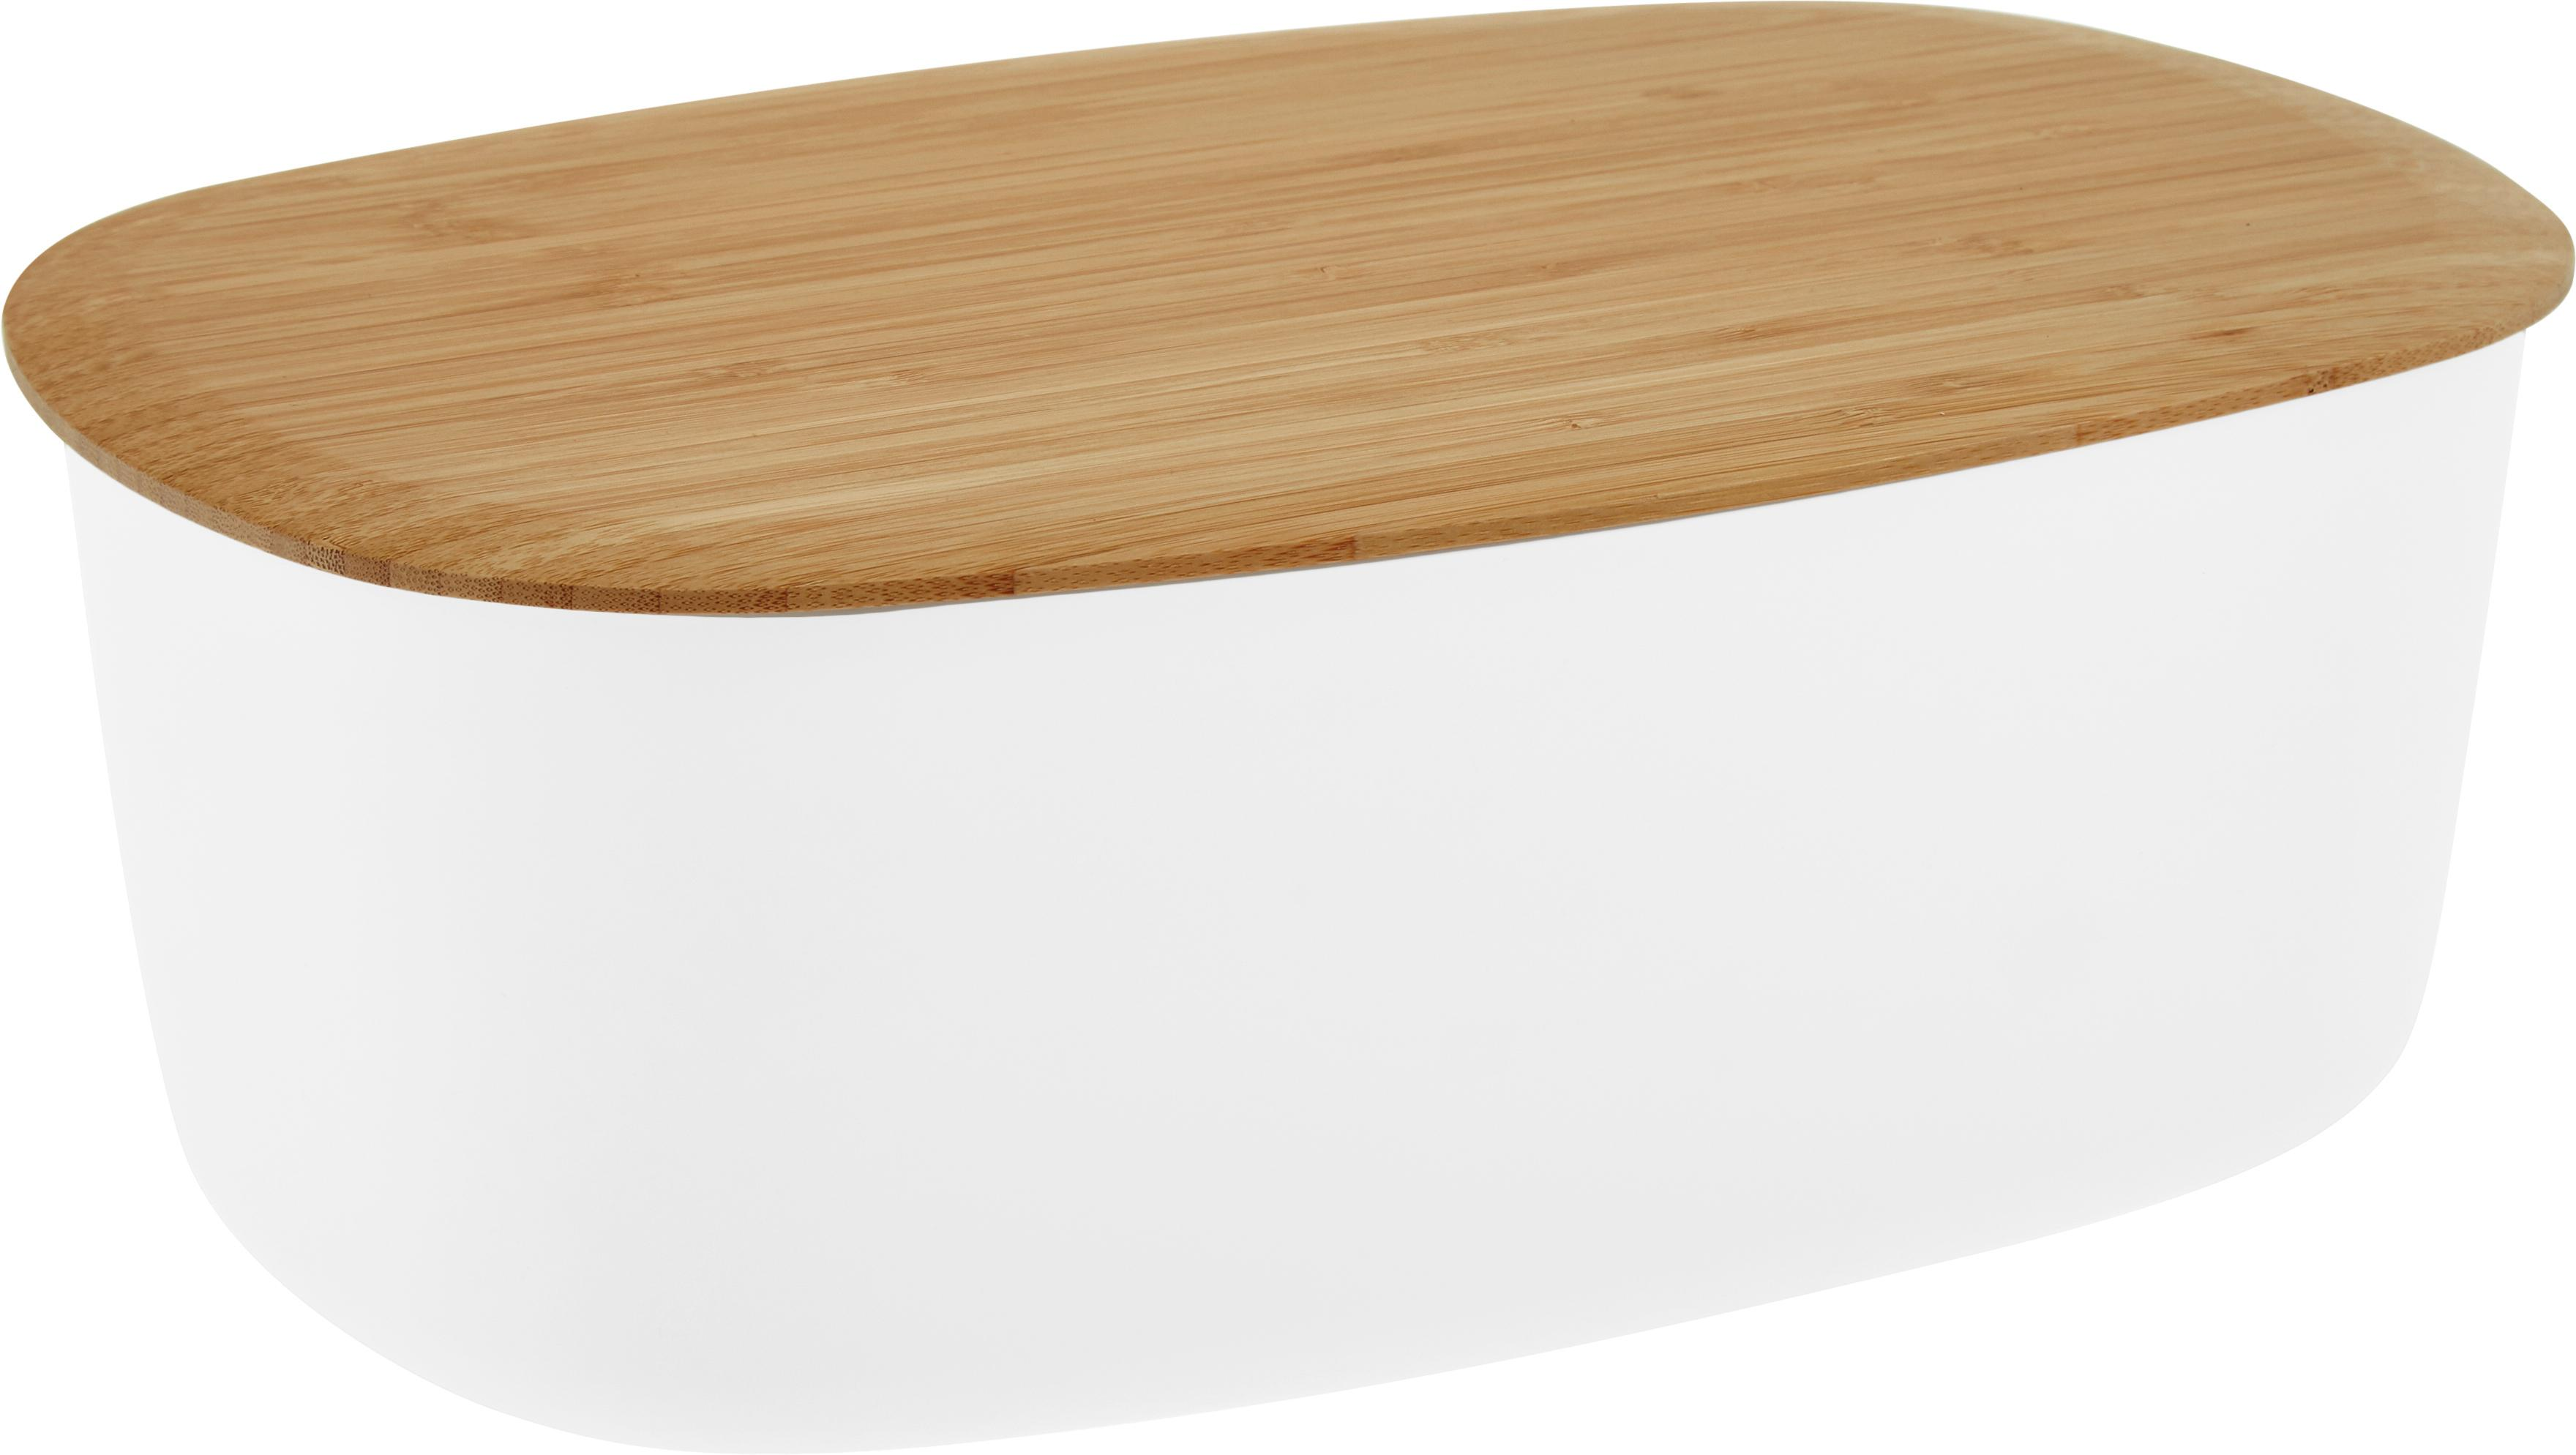 Design broodtrommel Box-It met bamboehouten deksel, Melamine, bamboehout, Pot: wit. Deksel: bruin, 35 x 12 cm